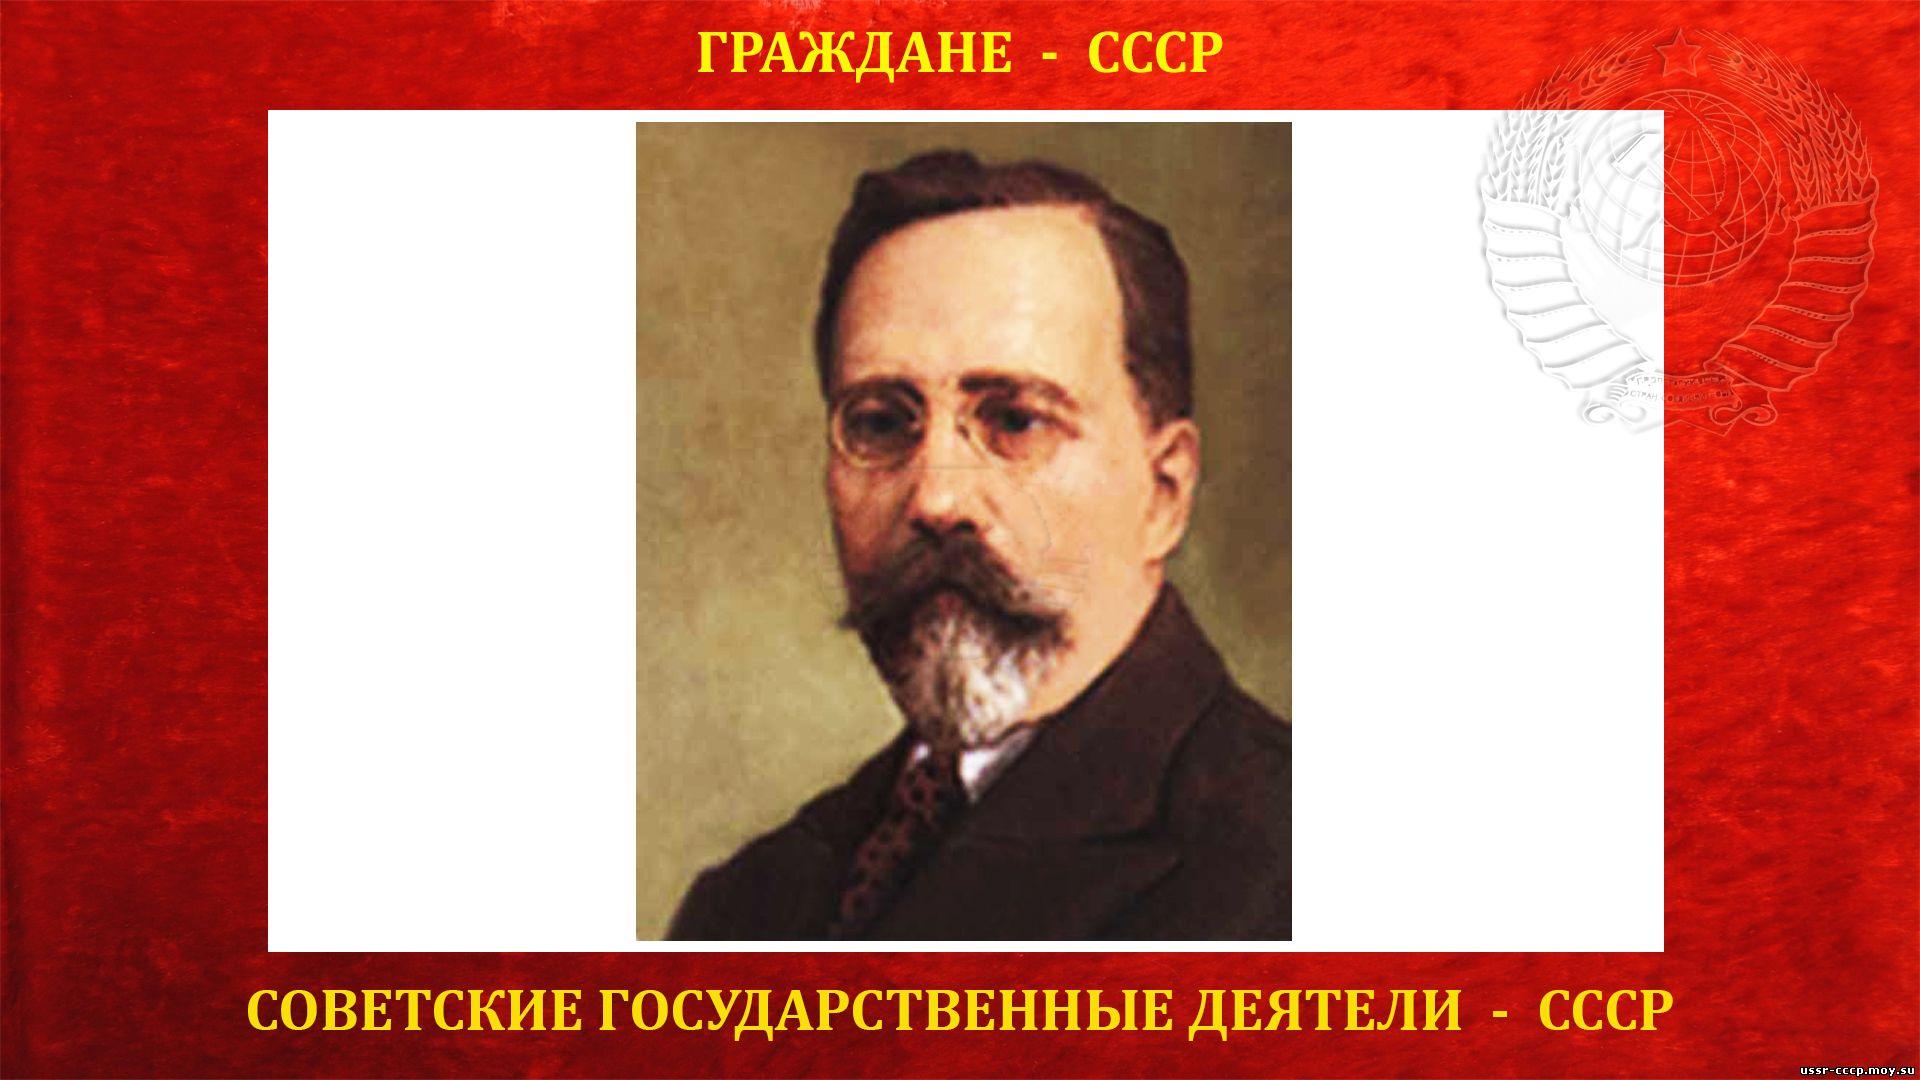 Каменев Л.Б. (Биография)